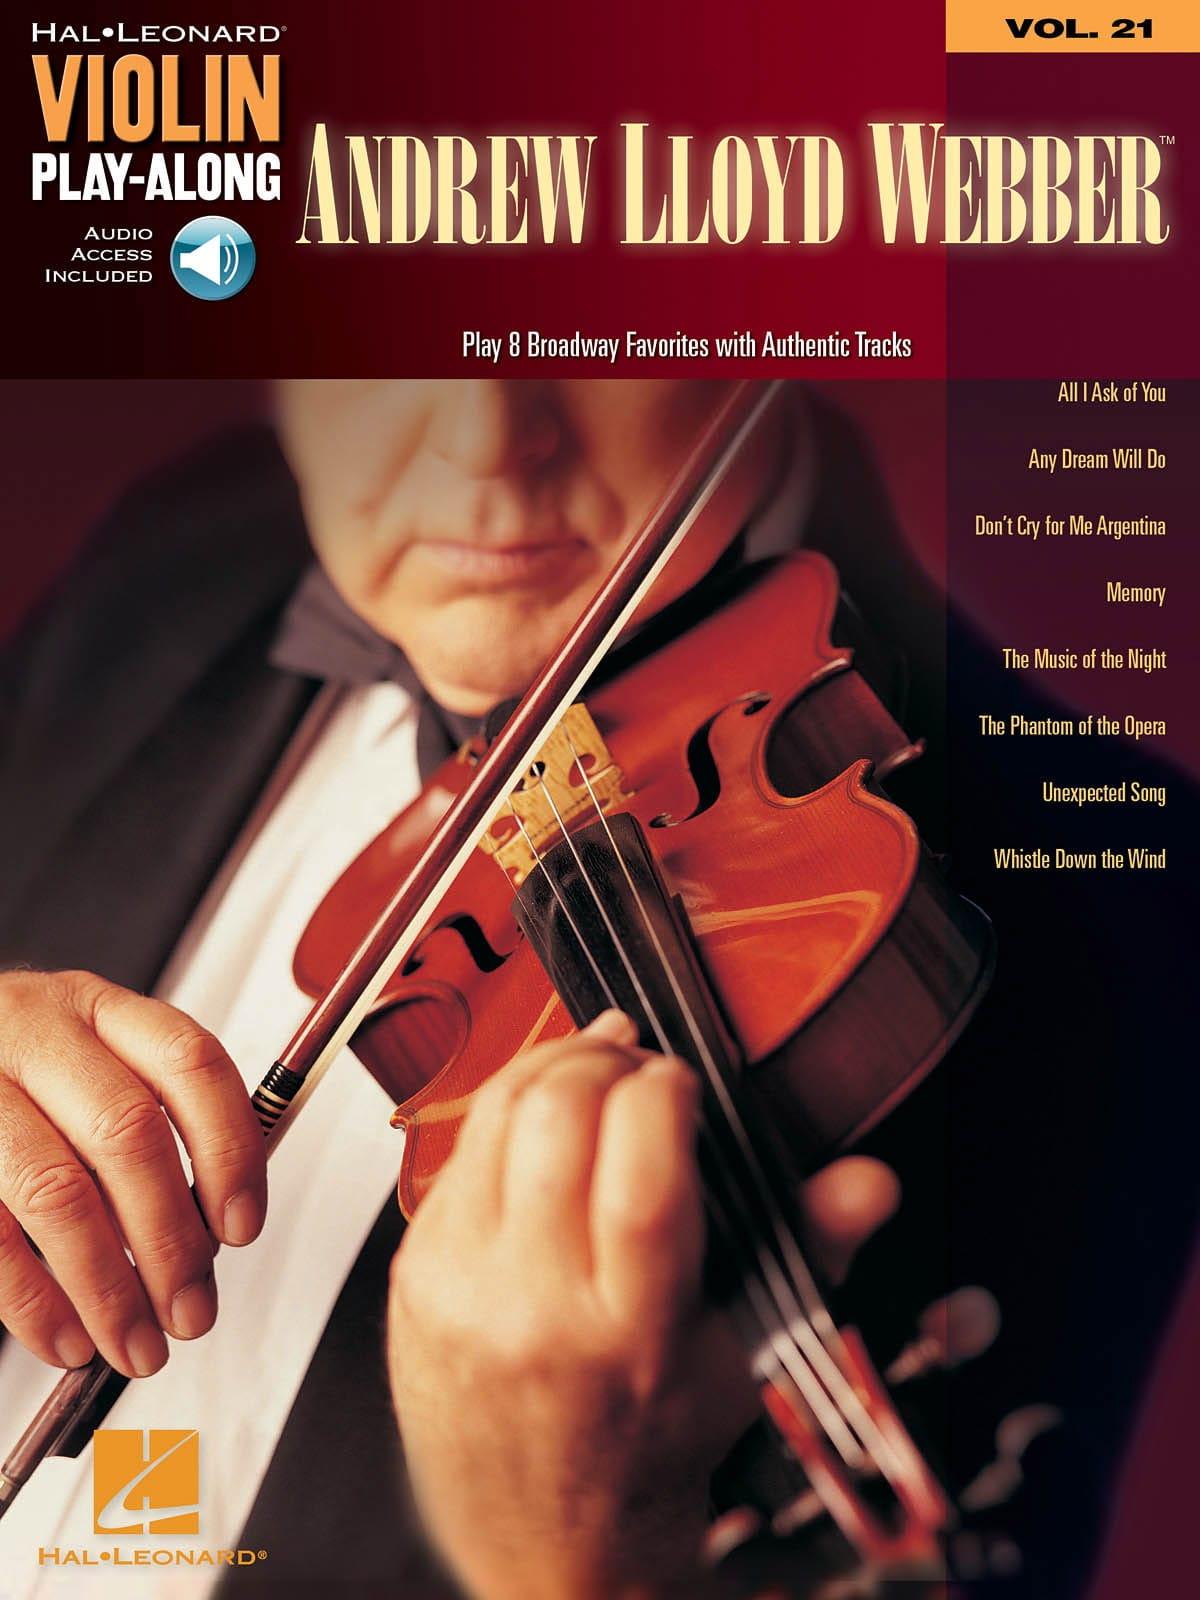 Violin play-along volume 21 - Andrew Lloyd Webber - laflutedepan.com